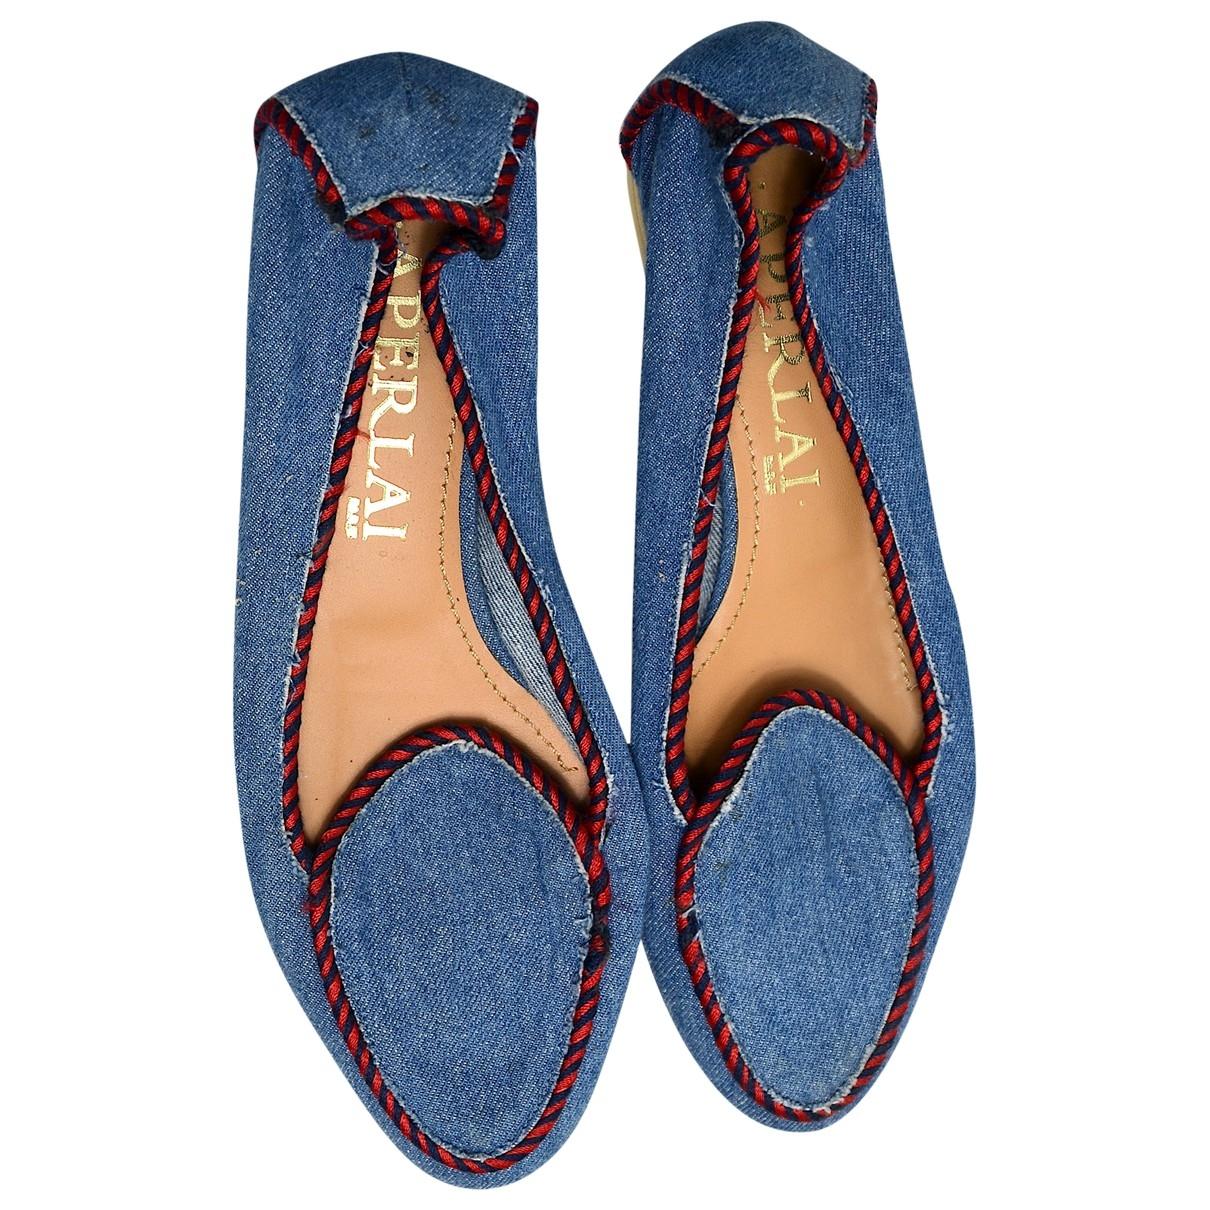 Aperlai - Ballerines   pour femme en toile - bleu